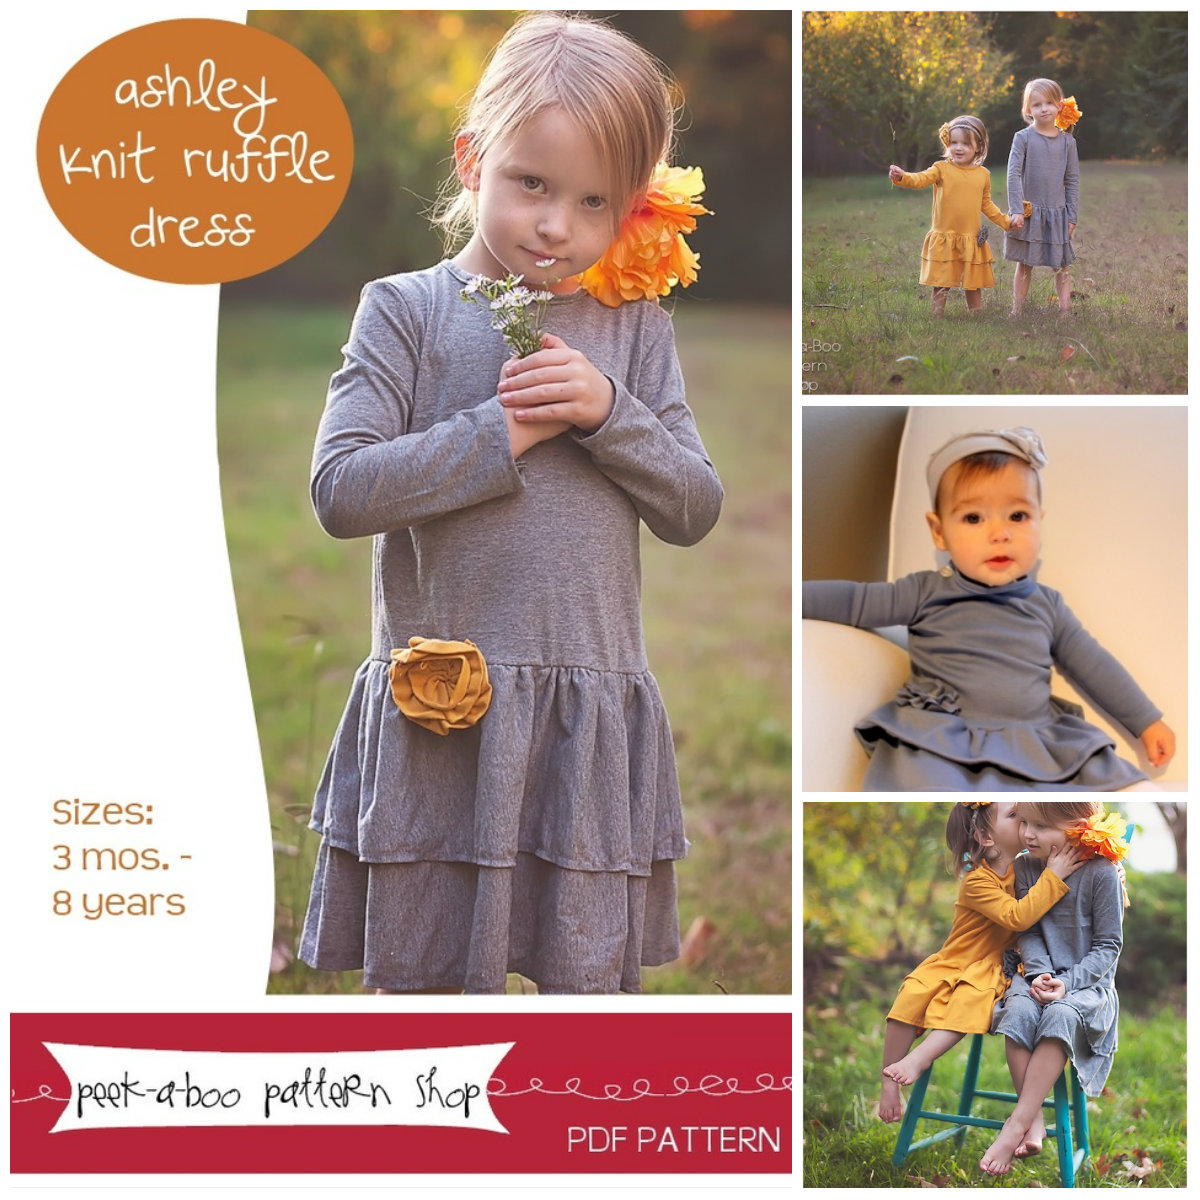 Peek-A Boo Ahsley Knit Ruffle Dress Digital Pattern ( Size 3 mo -8 years )